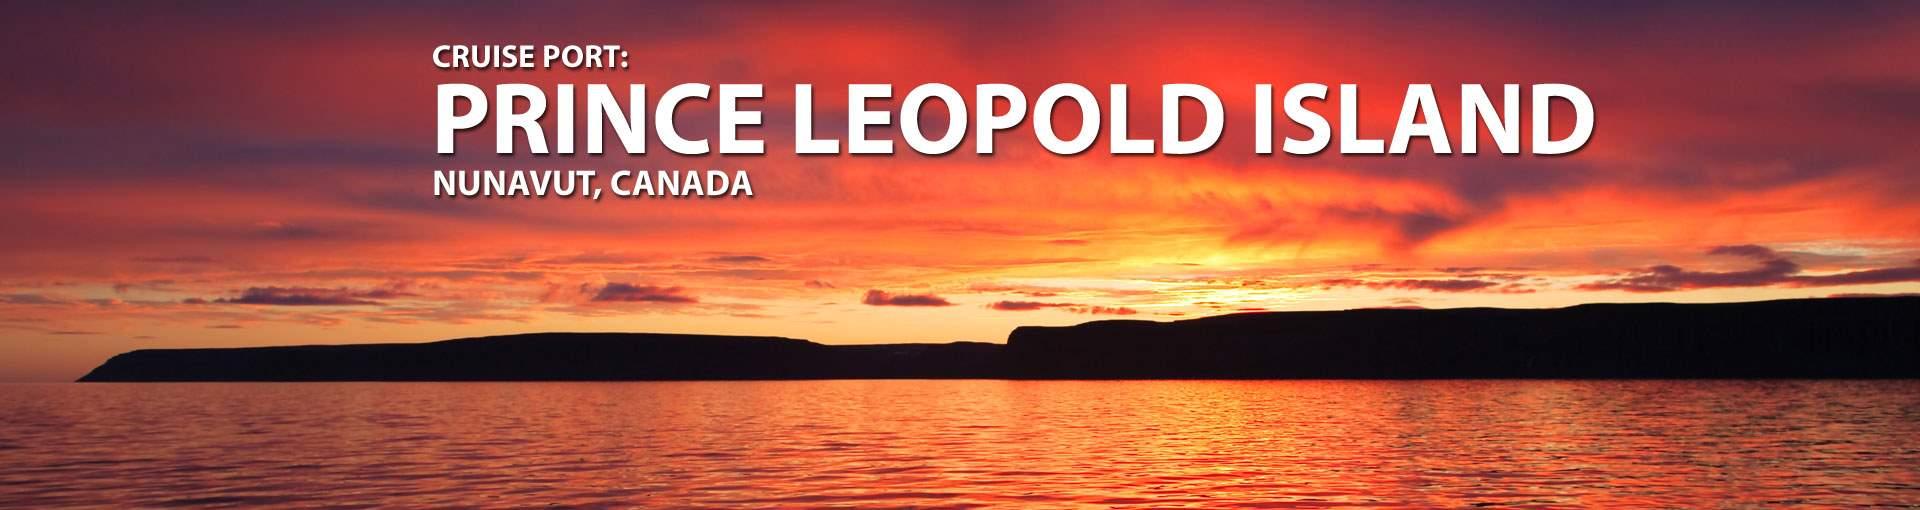 Cruises to Prince Leopold Island, Nunavut, Canada